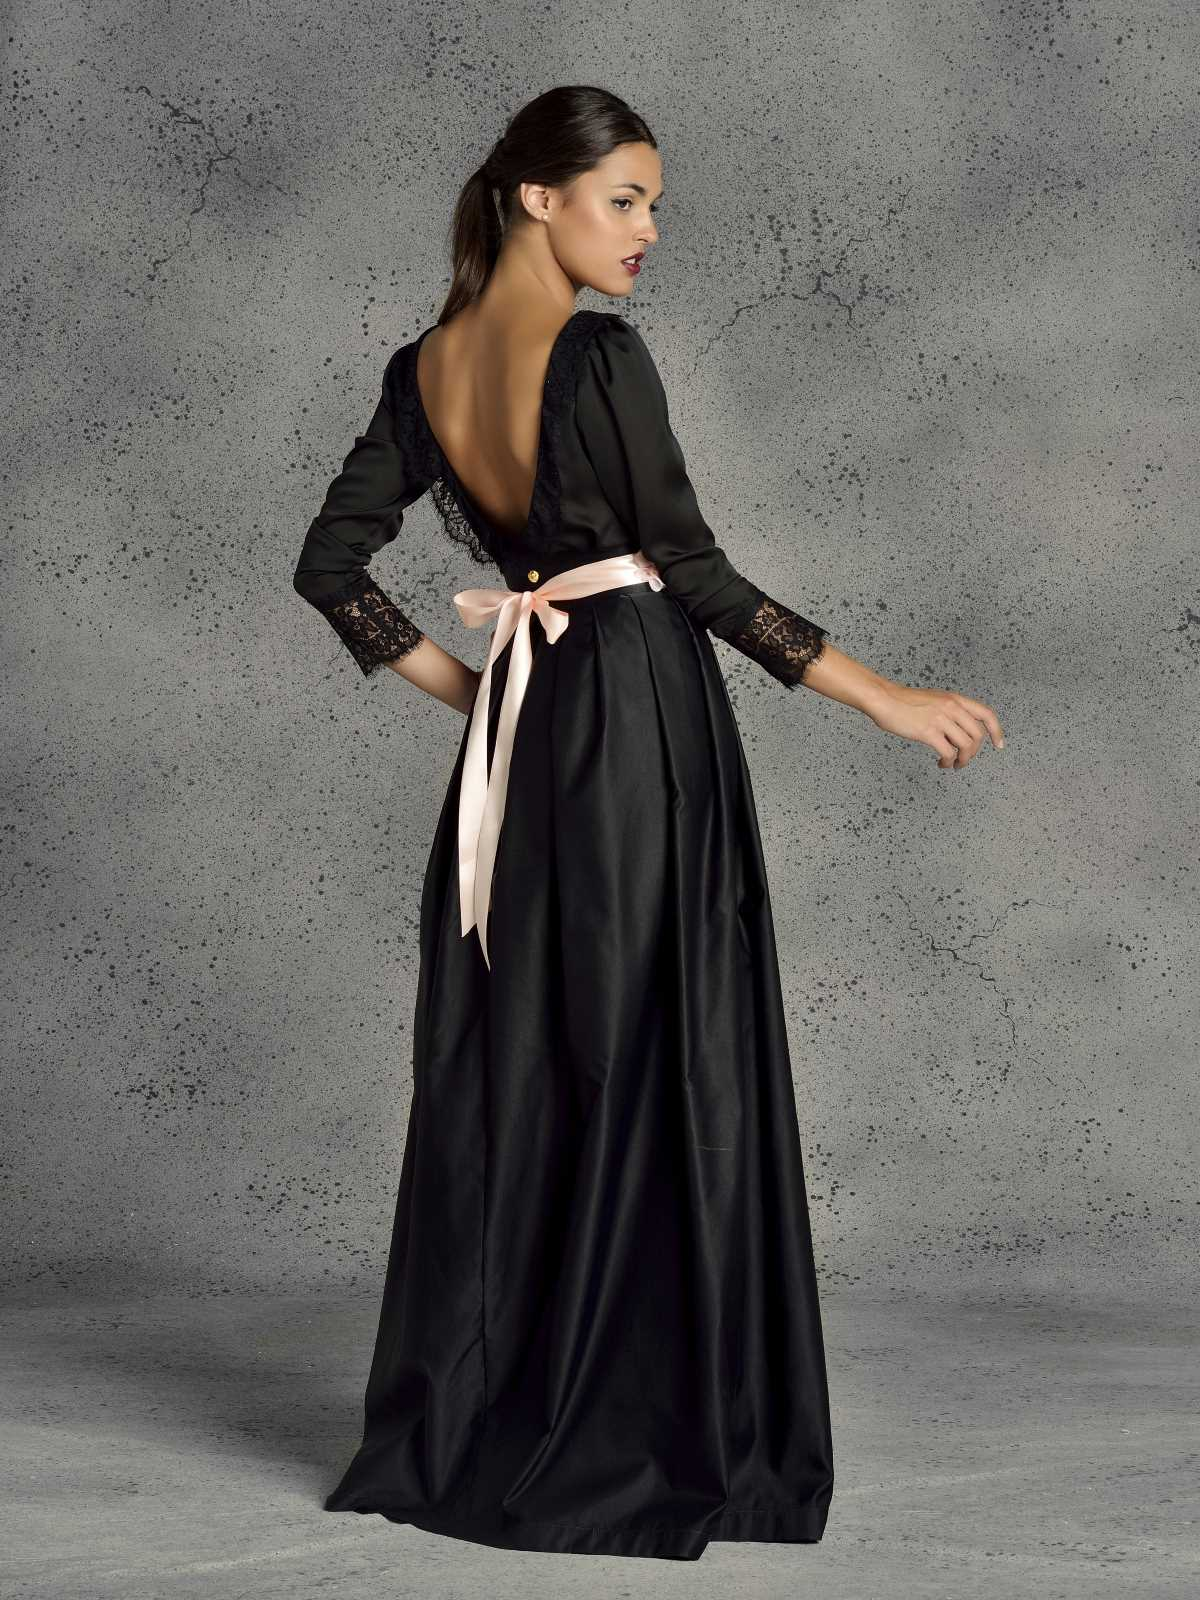 falda de fiesta larga negra para ceremonia